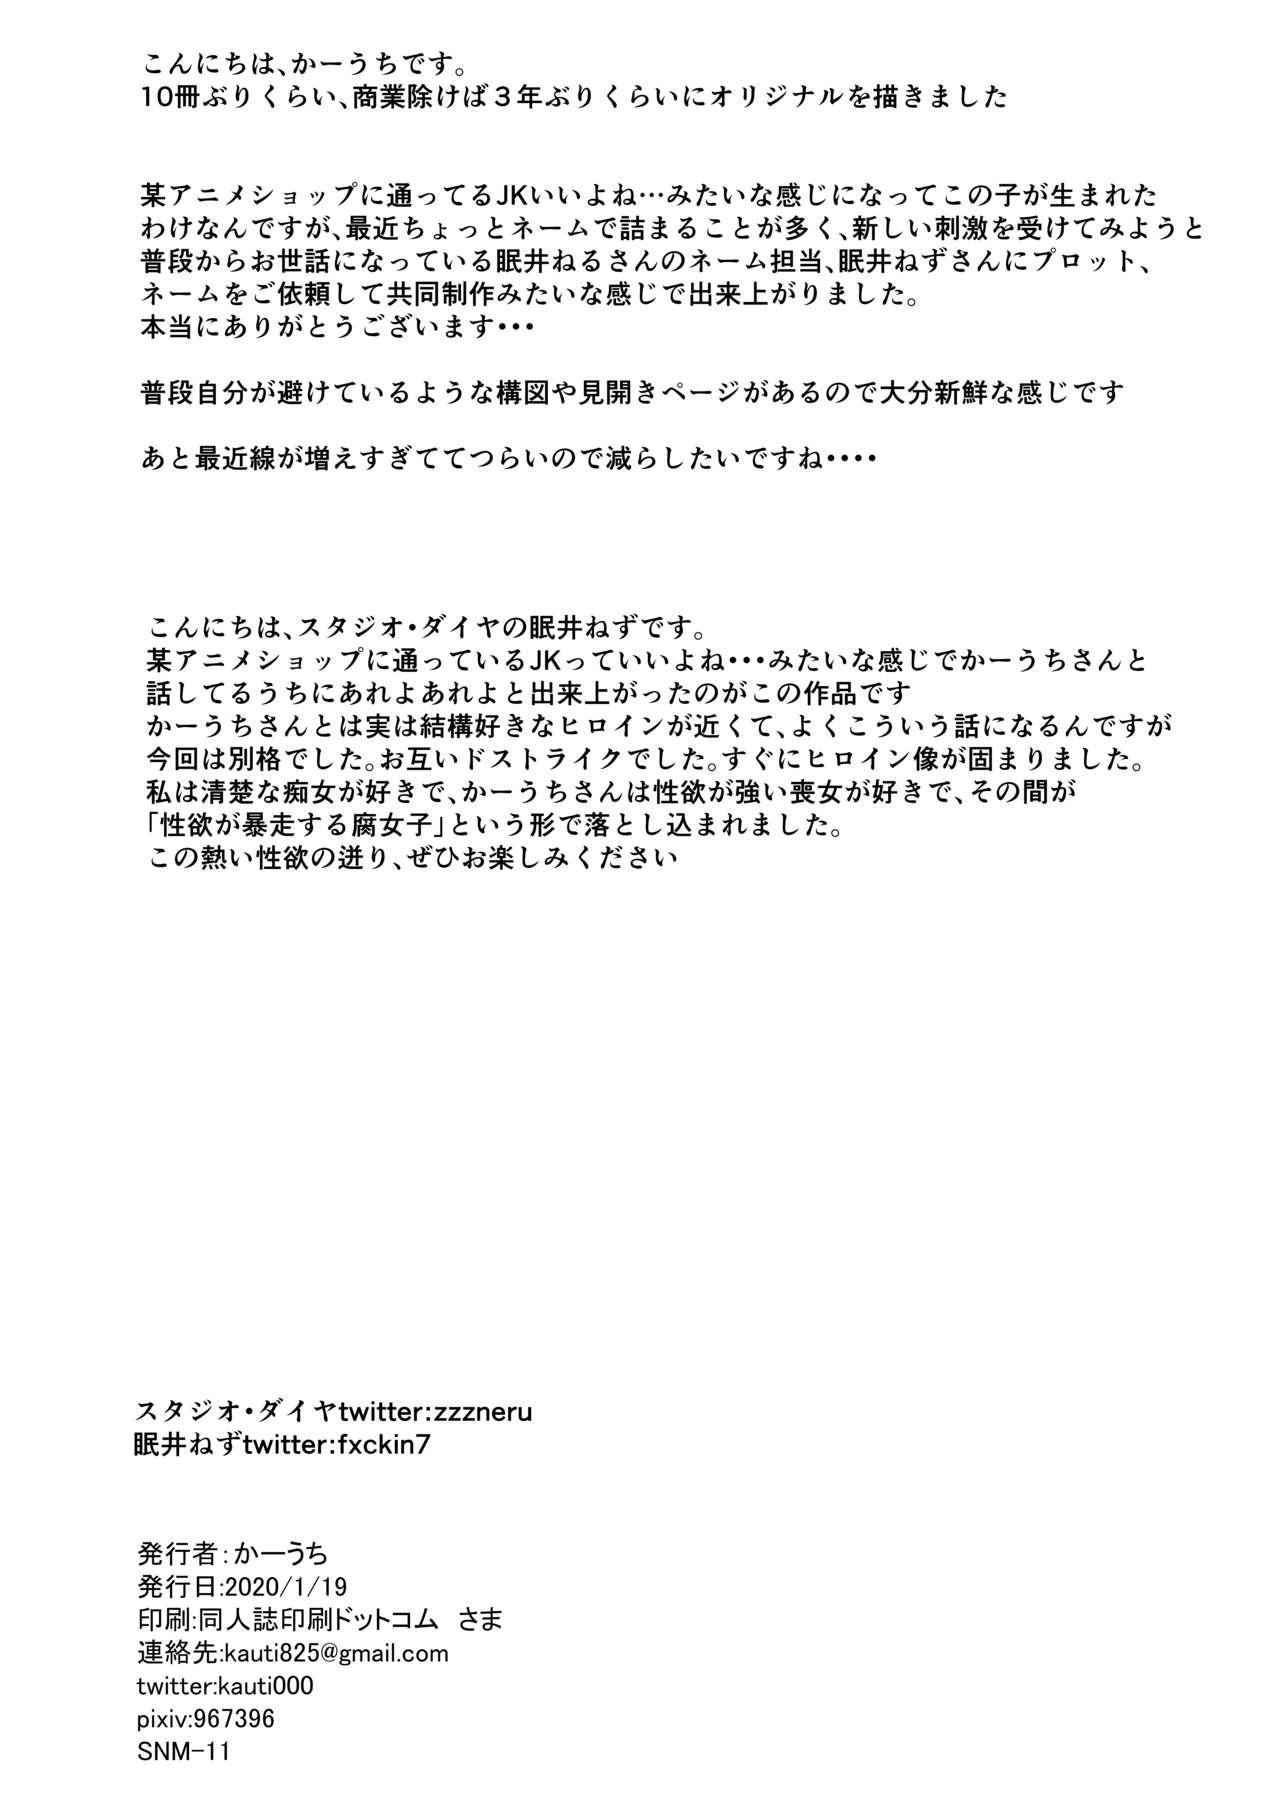 [Shiko Neru Mix (Kauti)] Onee-san ga Kimi no Hajimete Moratte Ageyou ka!?   Would you give your first time to Onee-san!? [English] [ekiB] [Digital] 31